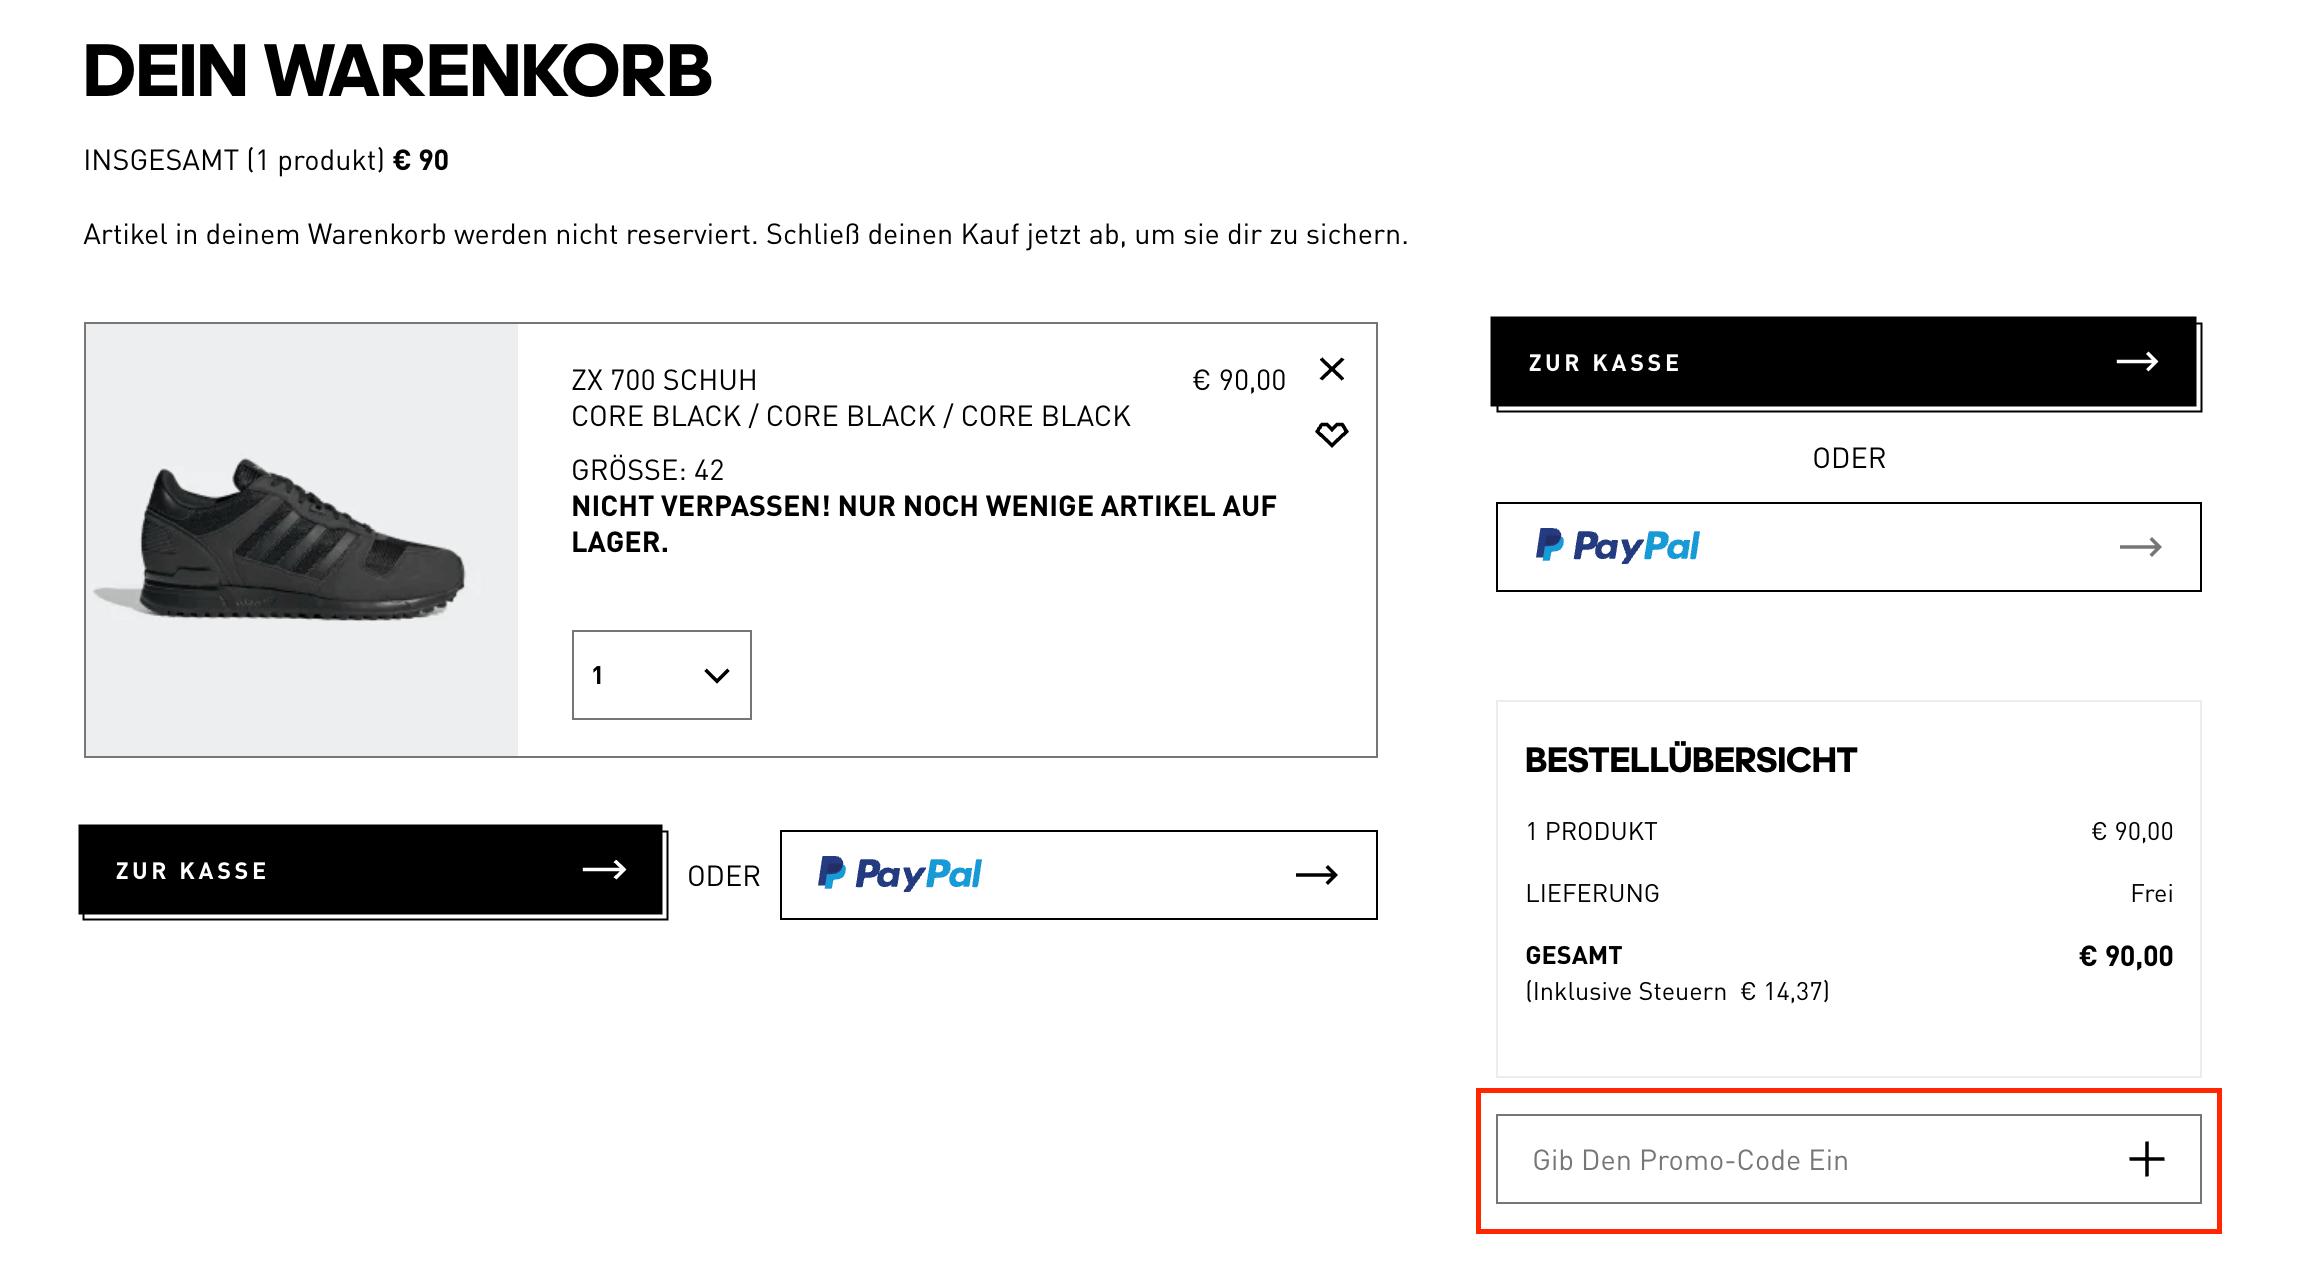 adidas shop-voucher_redemption-how-to